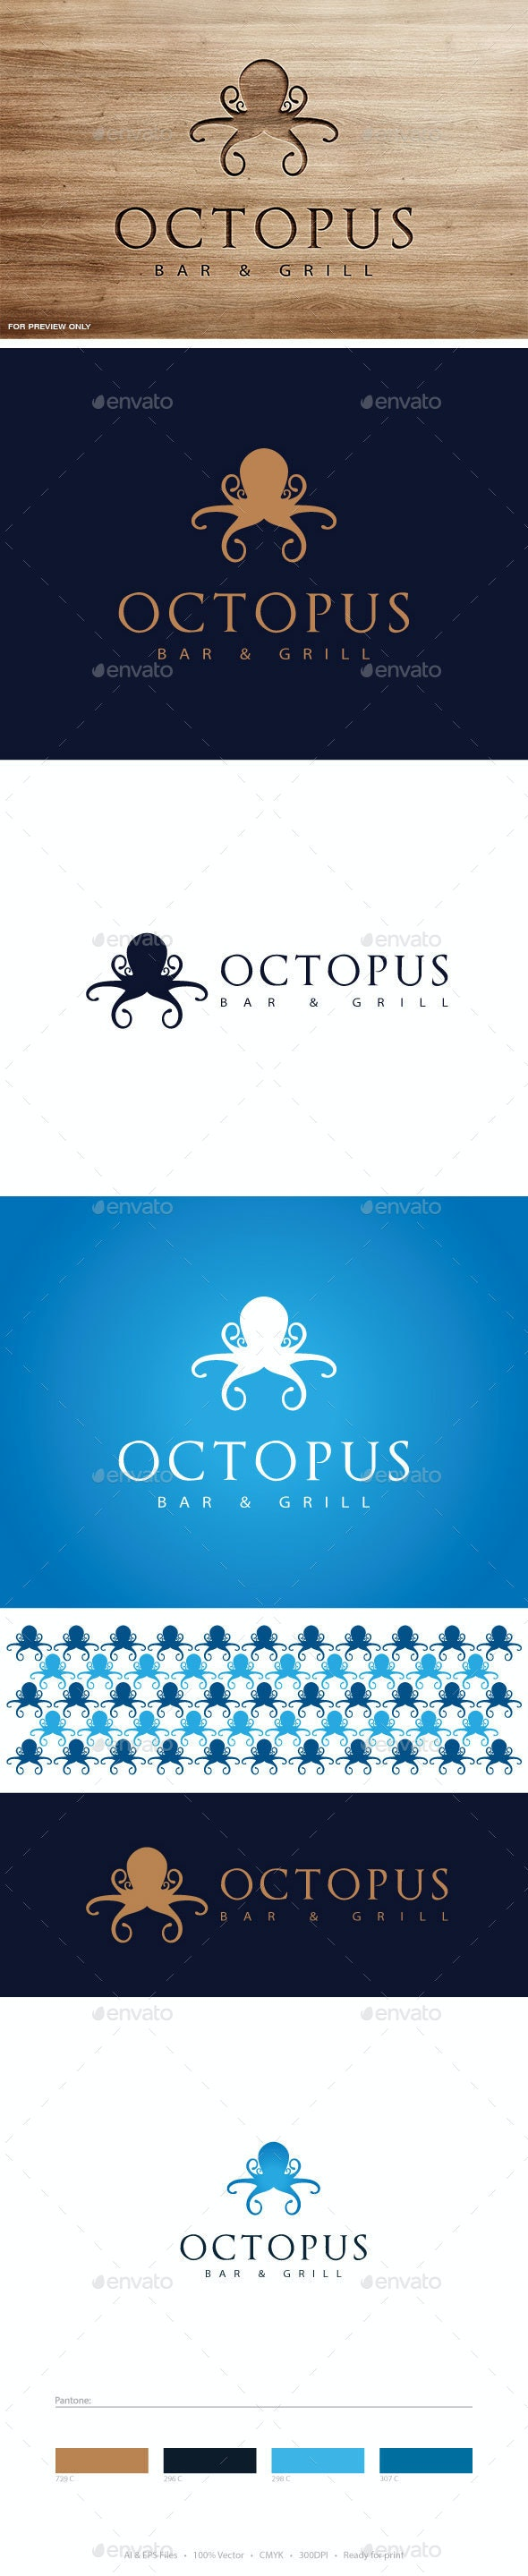 Octopus Logo Template - Animals Logo Templates